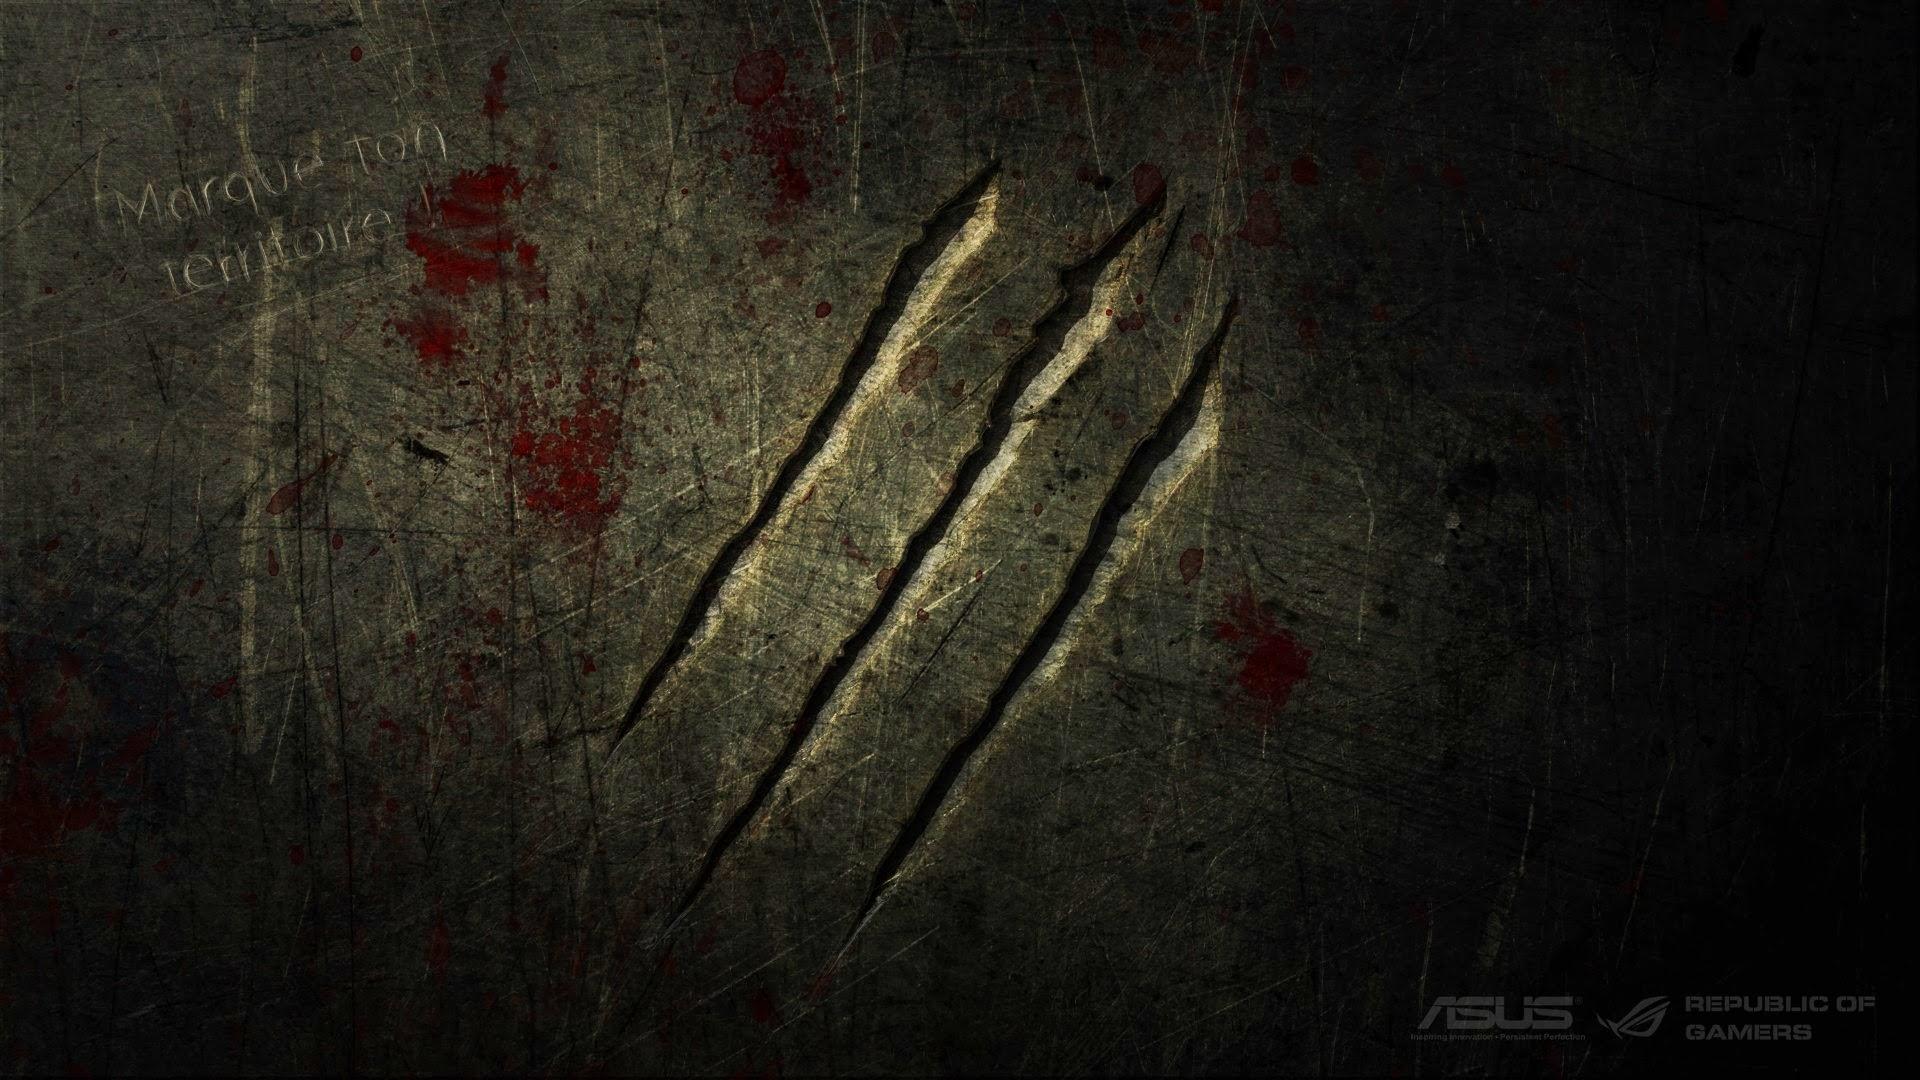 Wall Scratch Asus Republic Of Gamers A512 HD Wallpaper